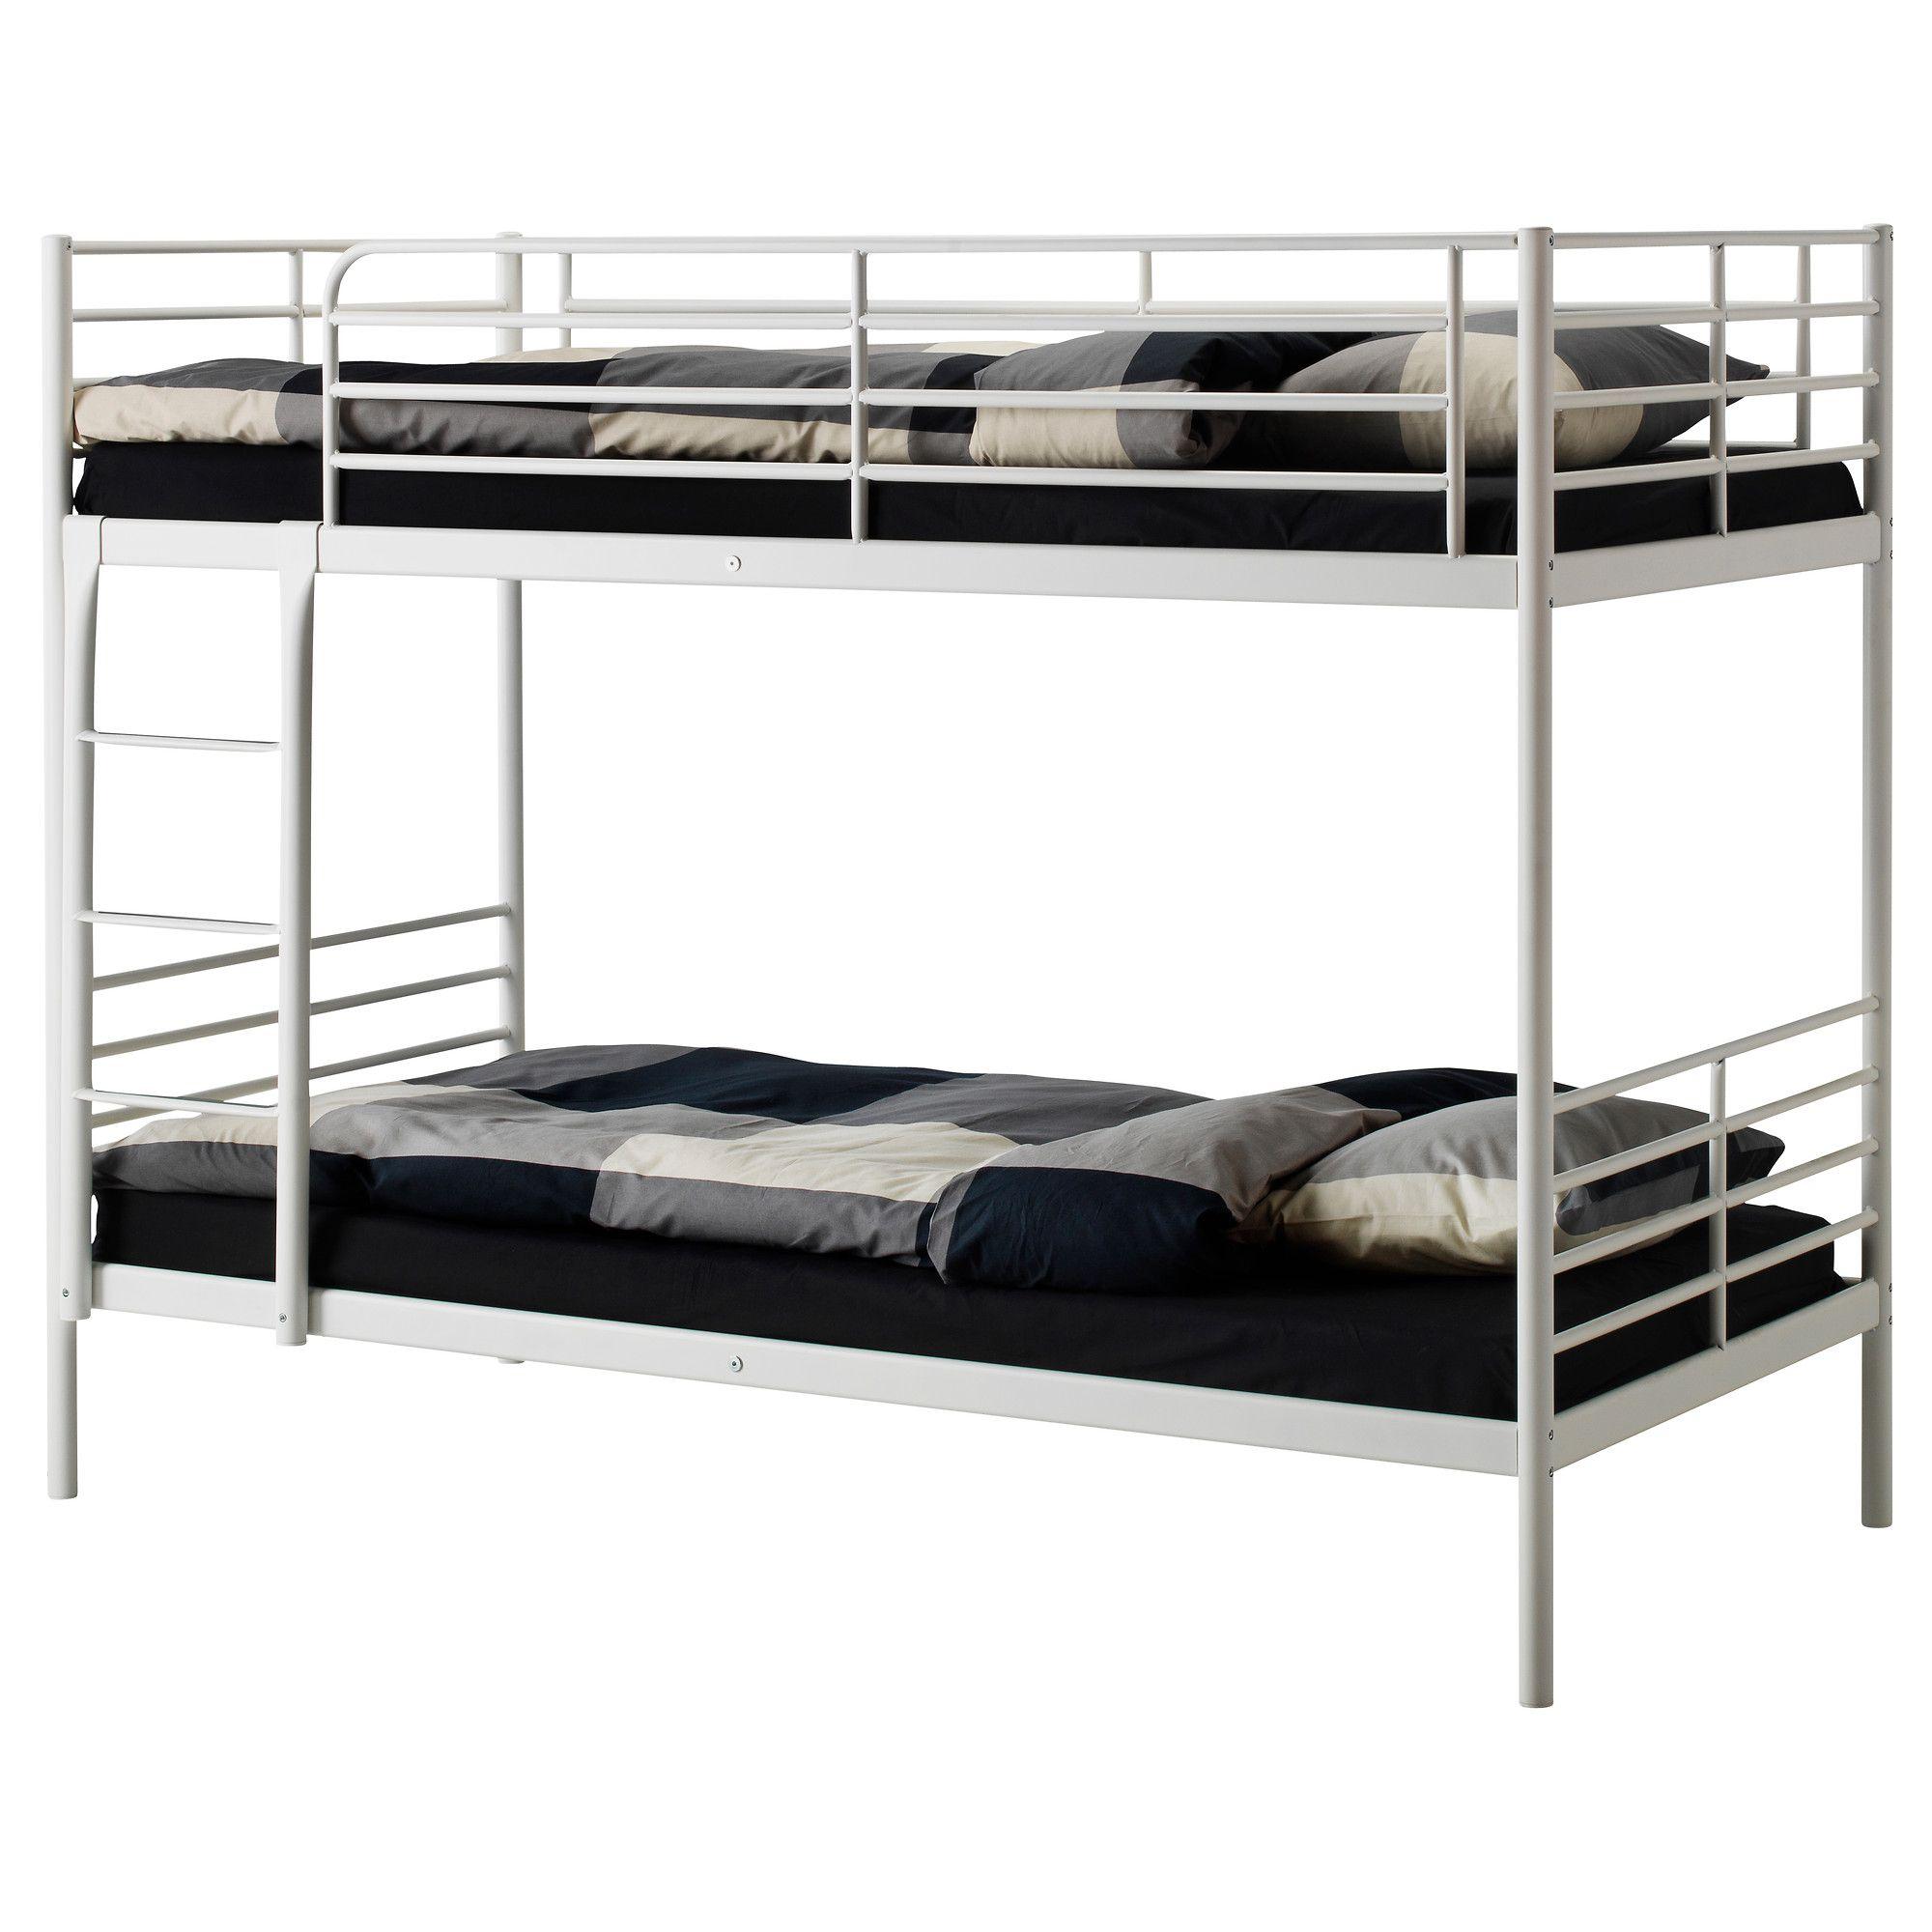 149 Tromso Bunk Bed Frame Ikea Decor Ikea